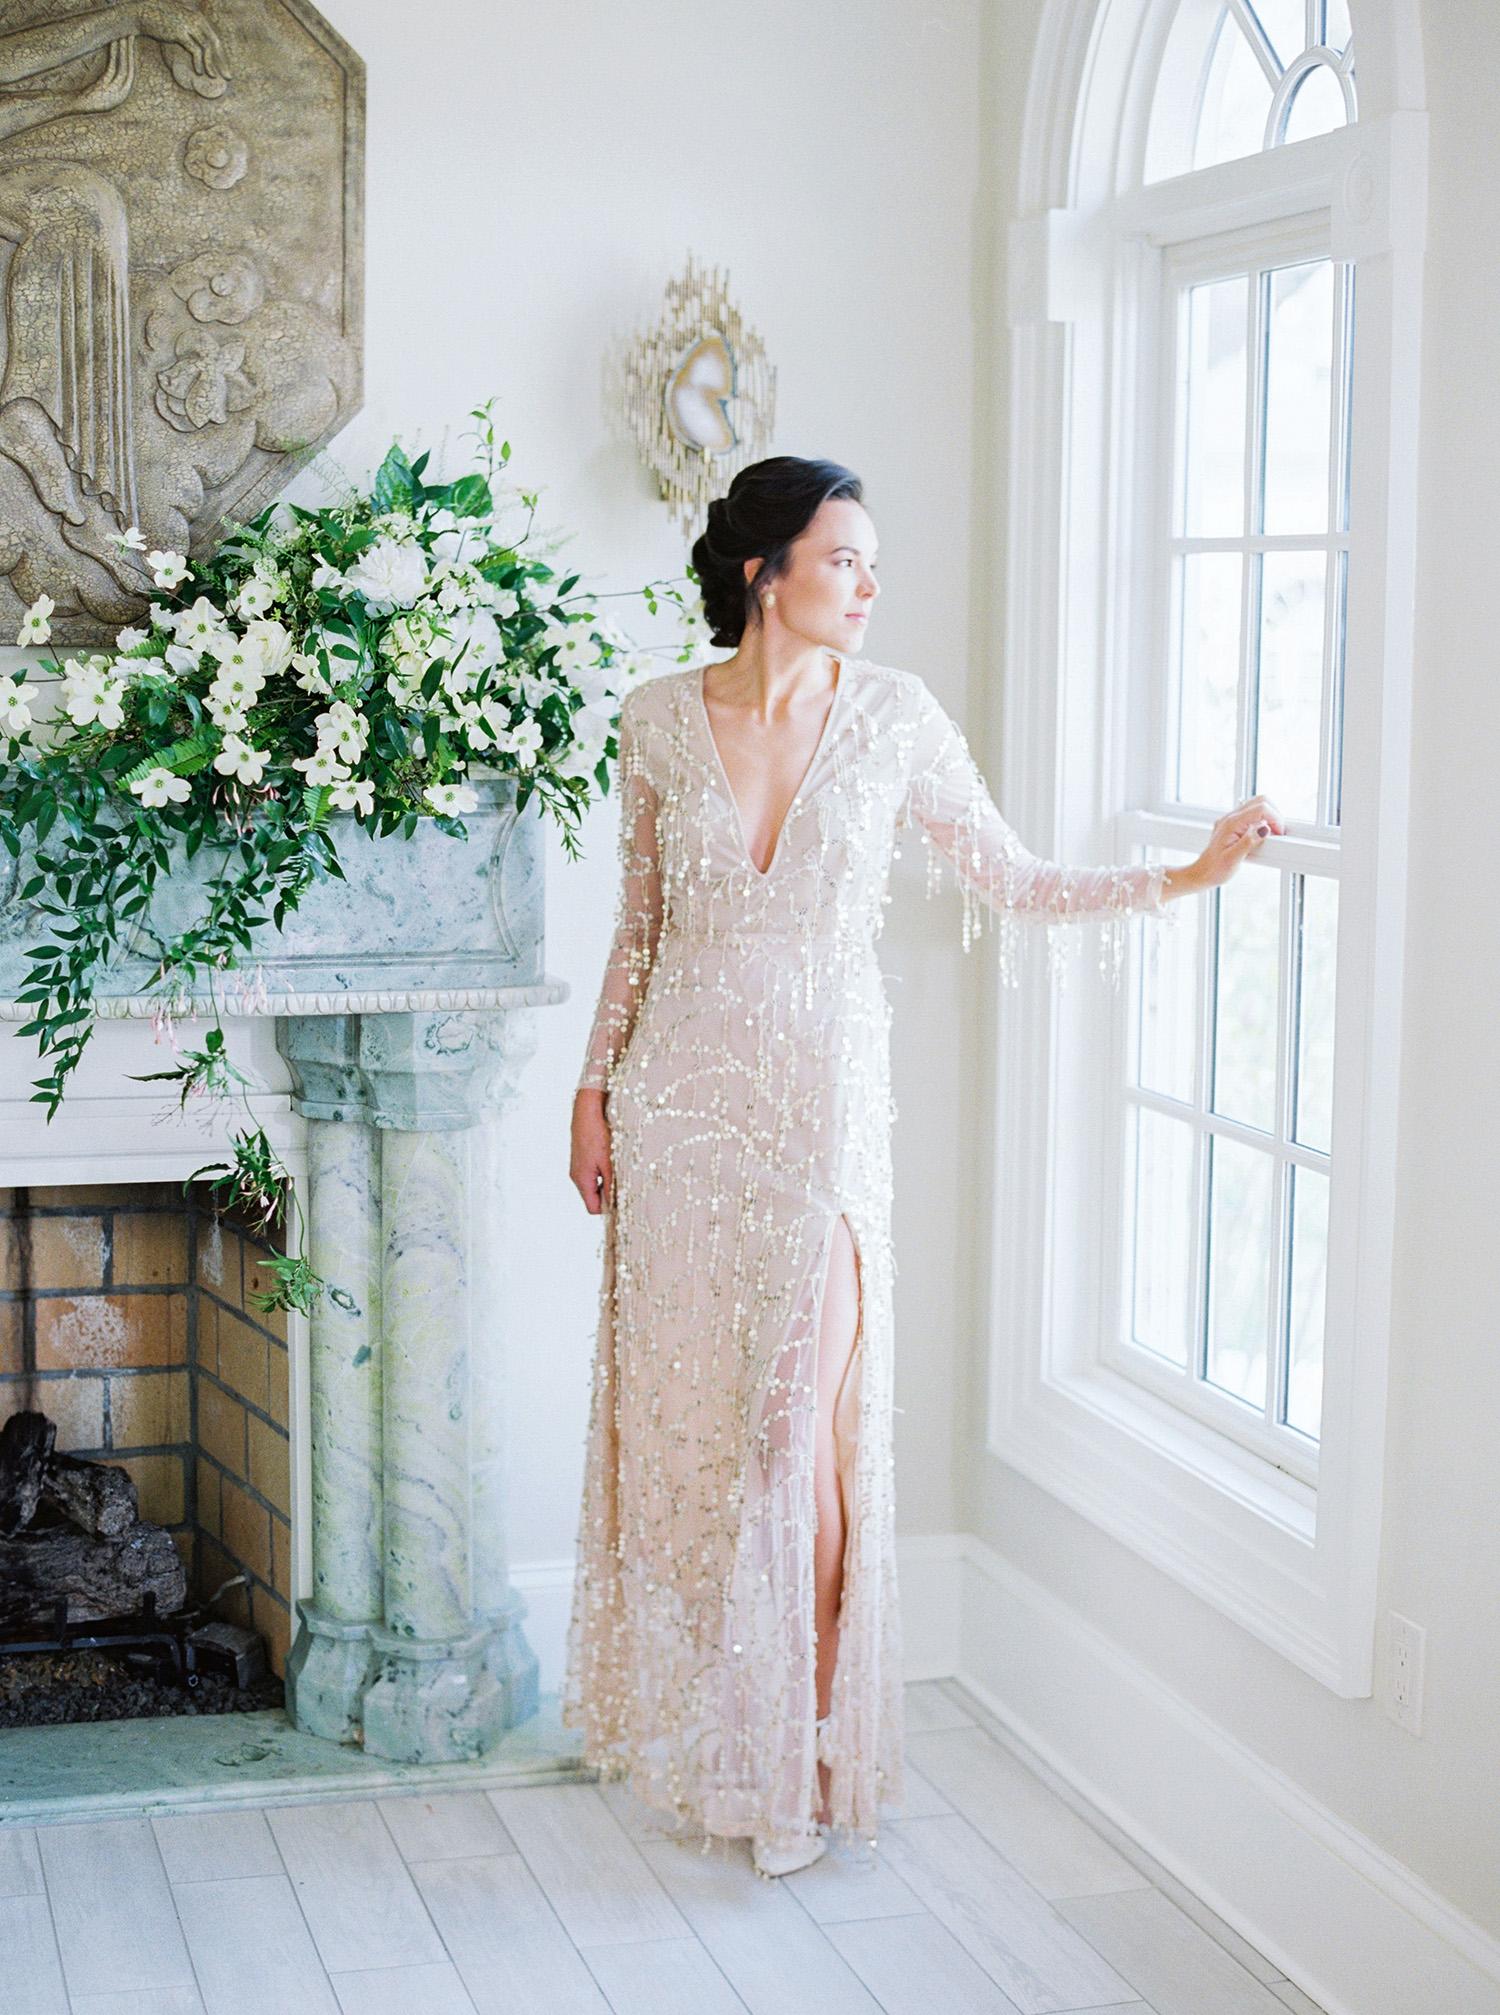 evan dustin vow renewal bride dress